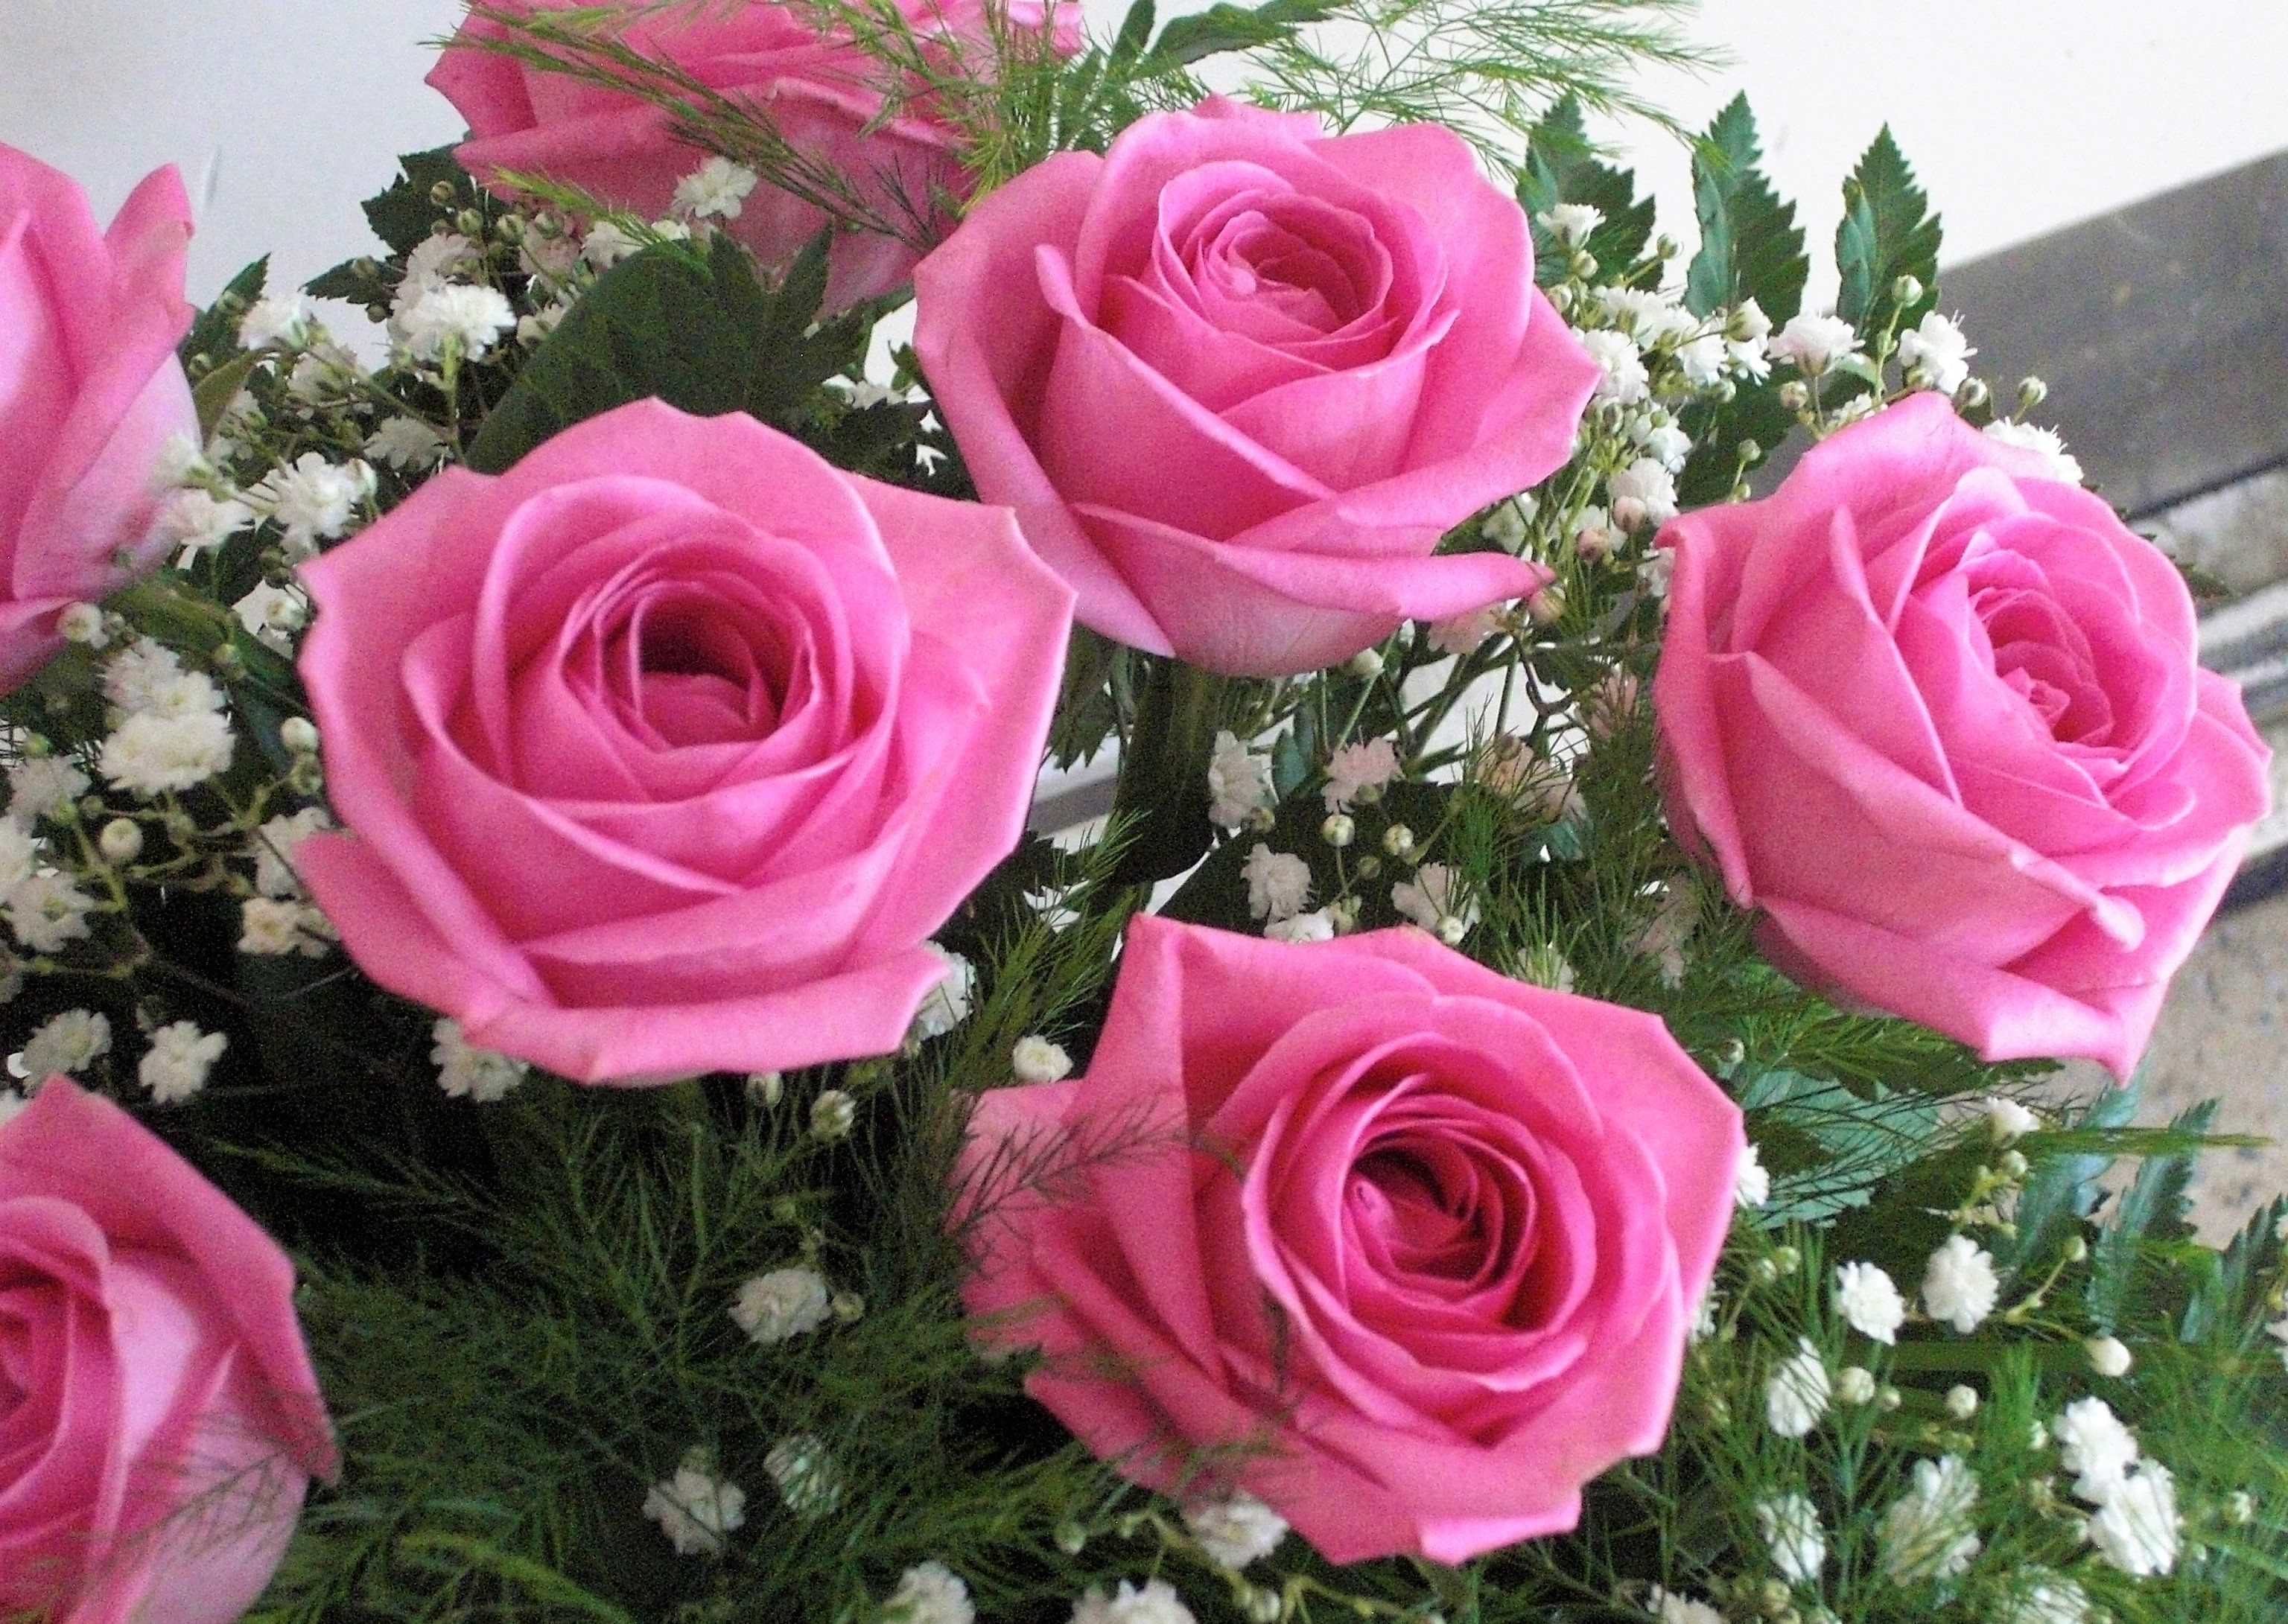 Roses de color